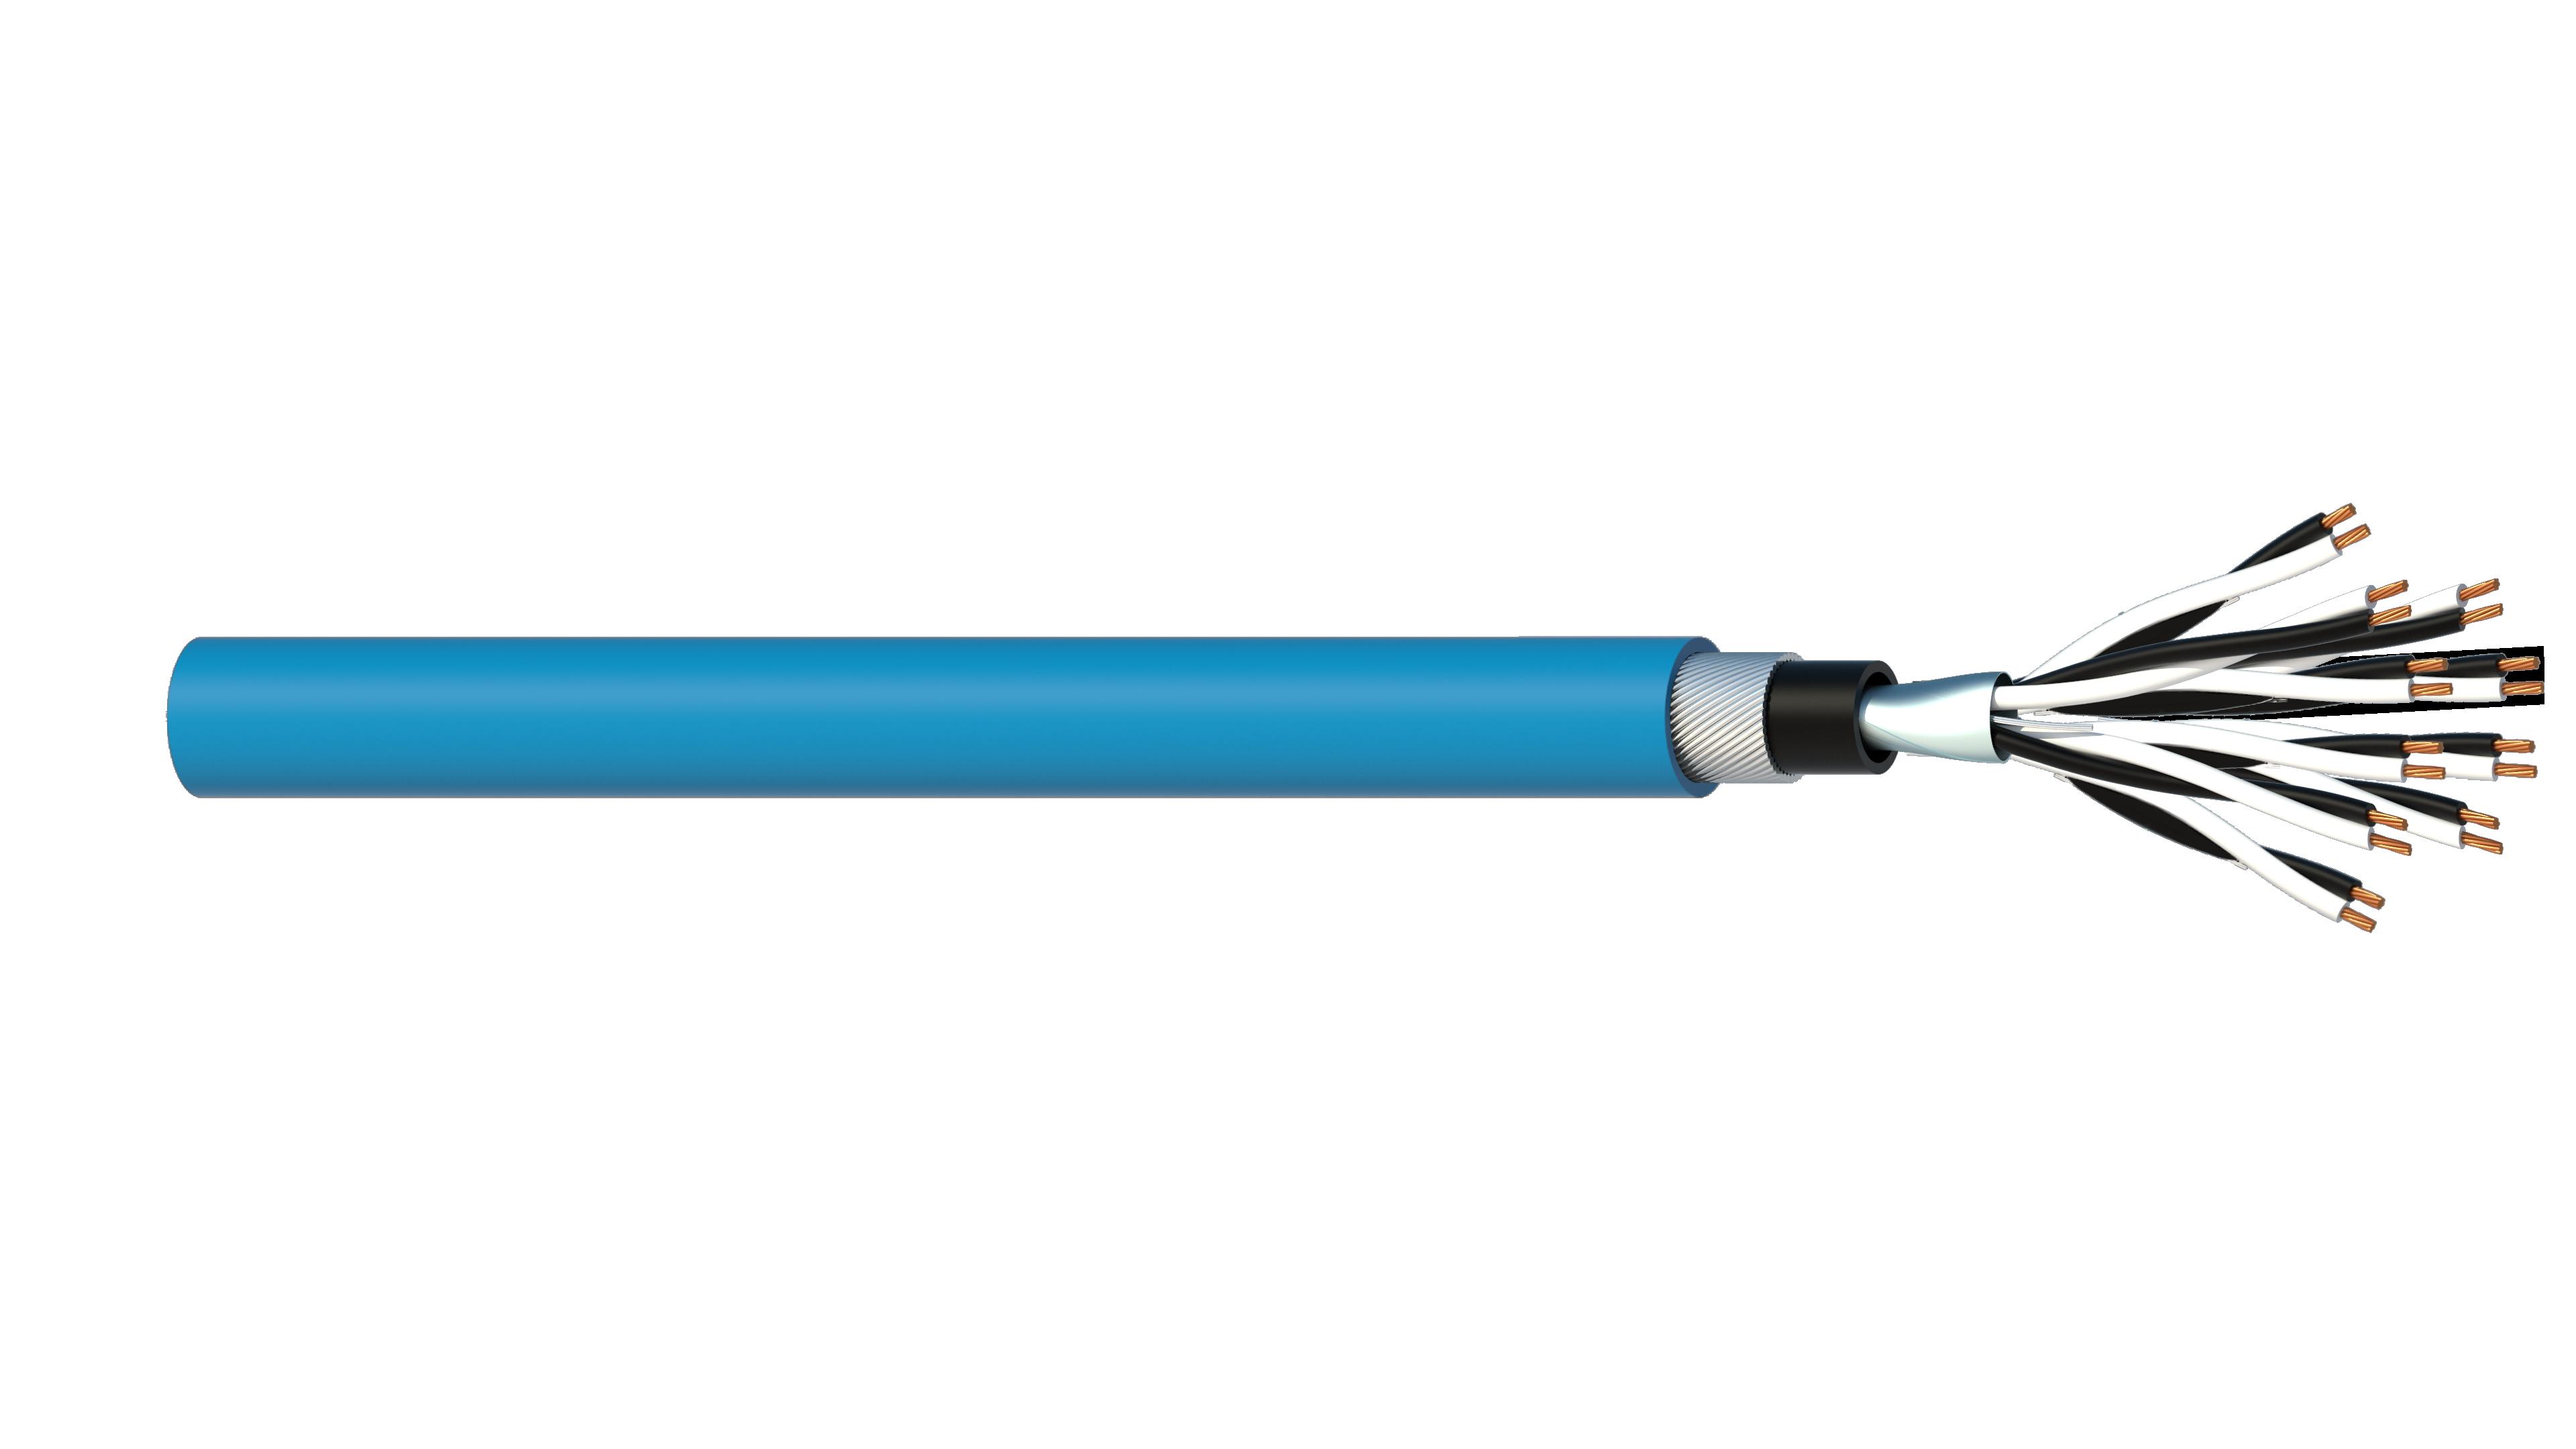 10 Pair 0.5mm2 Cu/PVC/OS/PVC/SWA/PVC Maser Instrumentation Cable - Blue Sheath